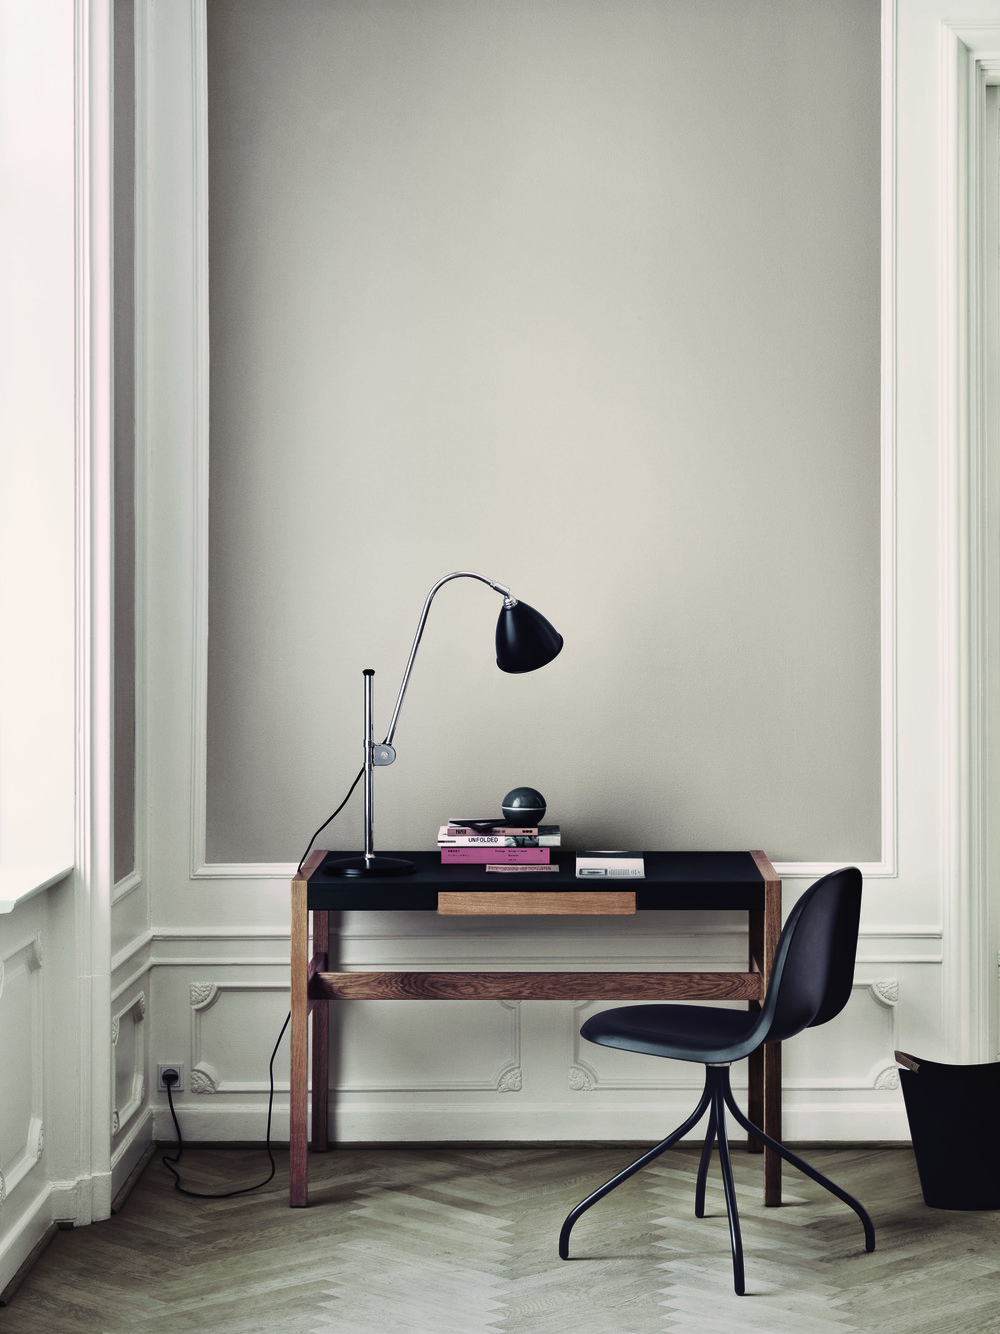 Bestlite Table Lamp BL1